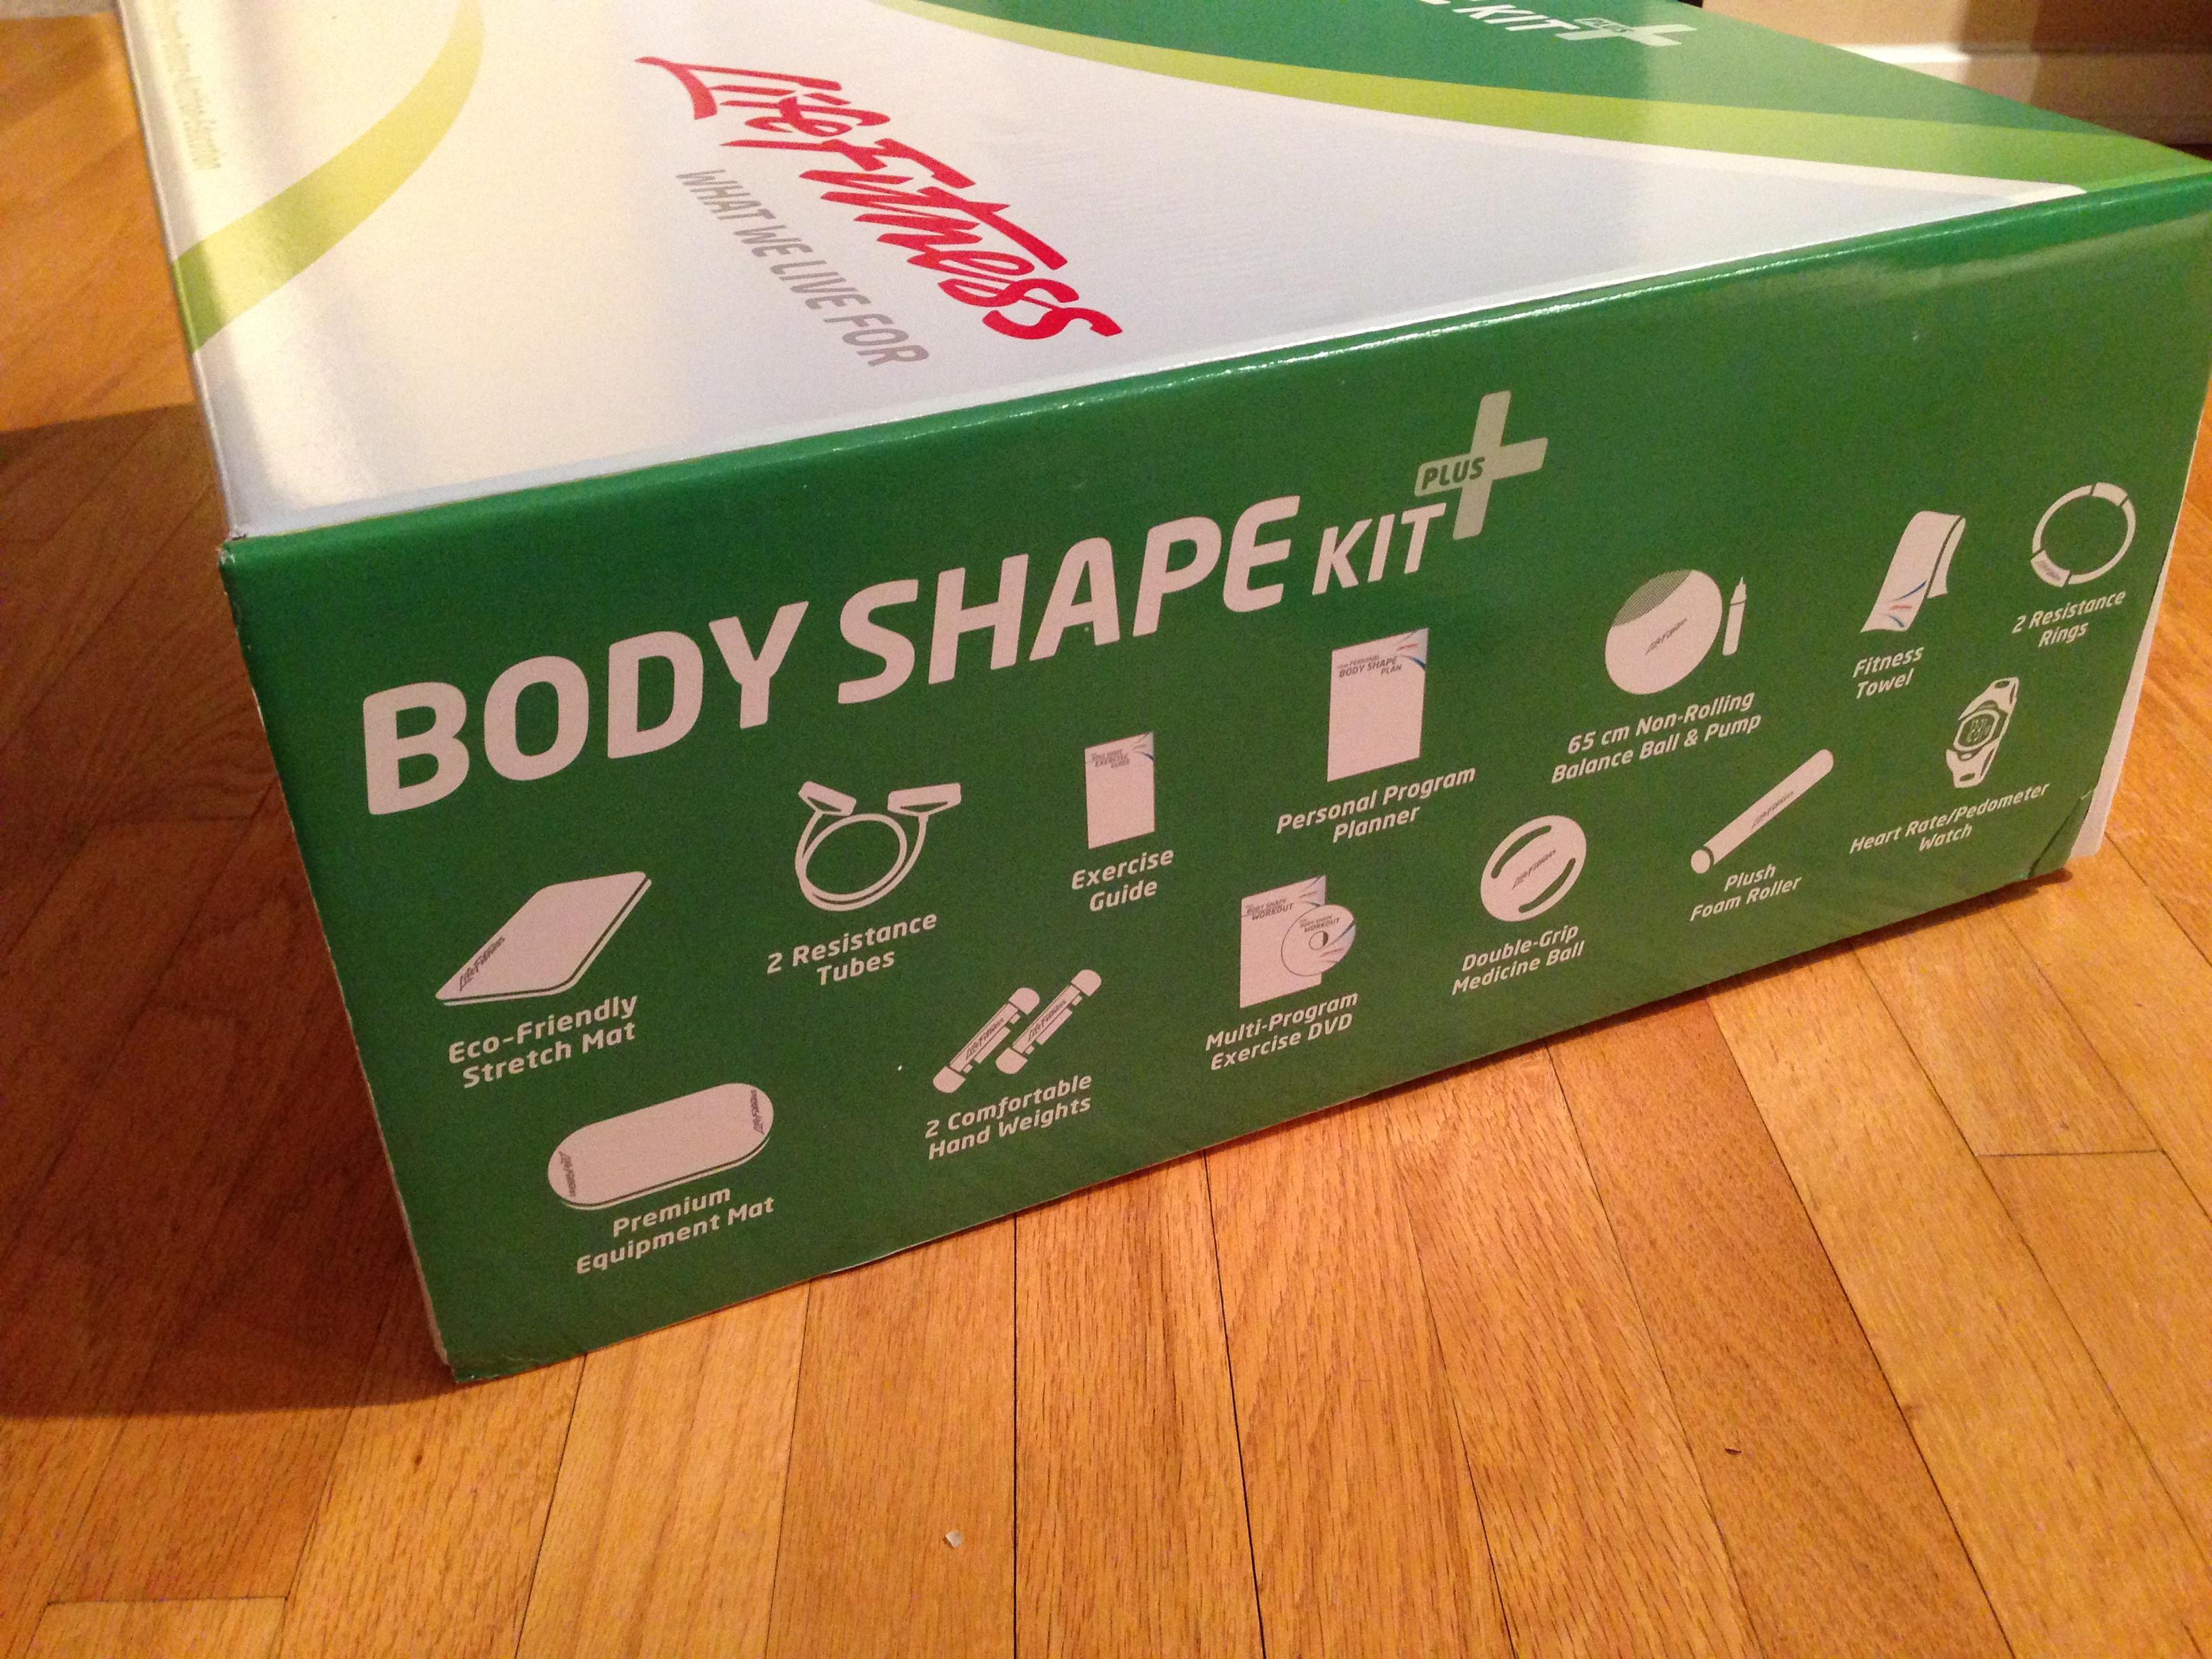 Life Fitness Body Shape Kit